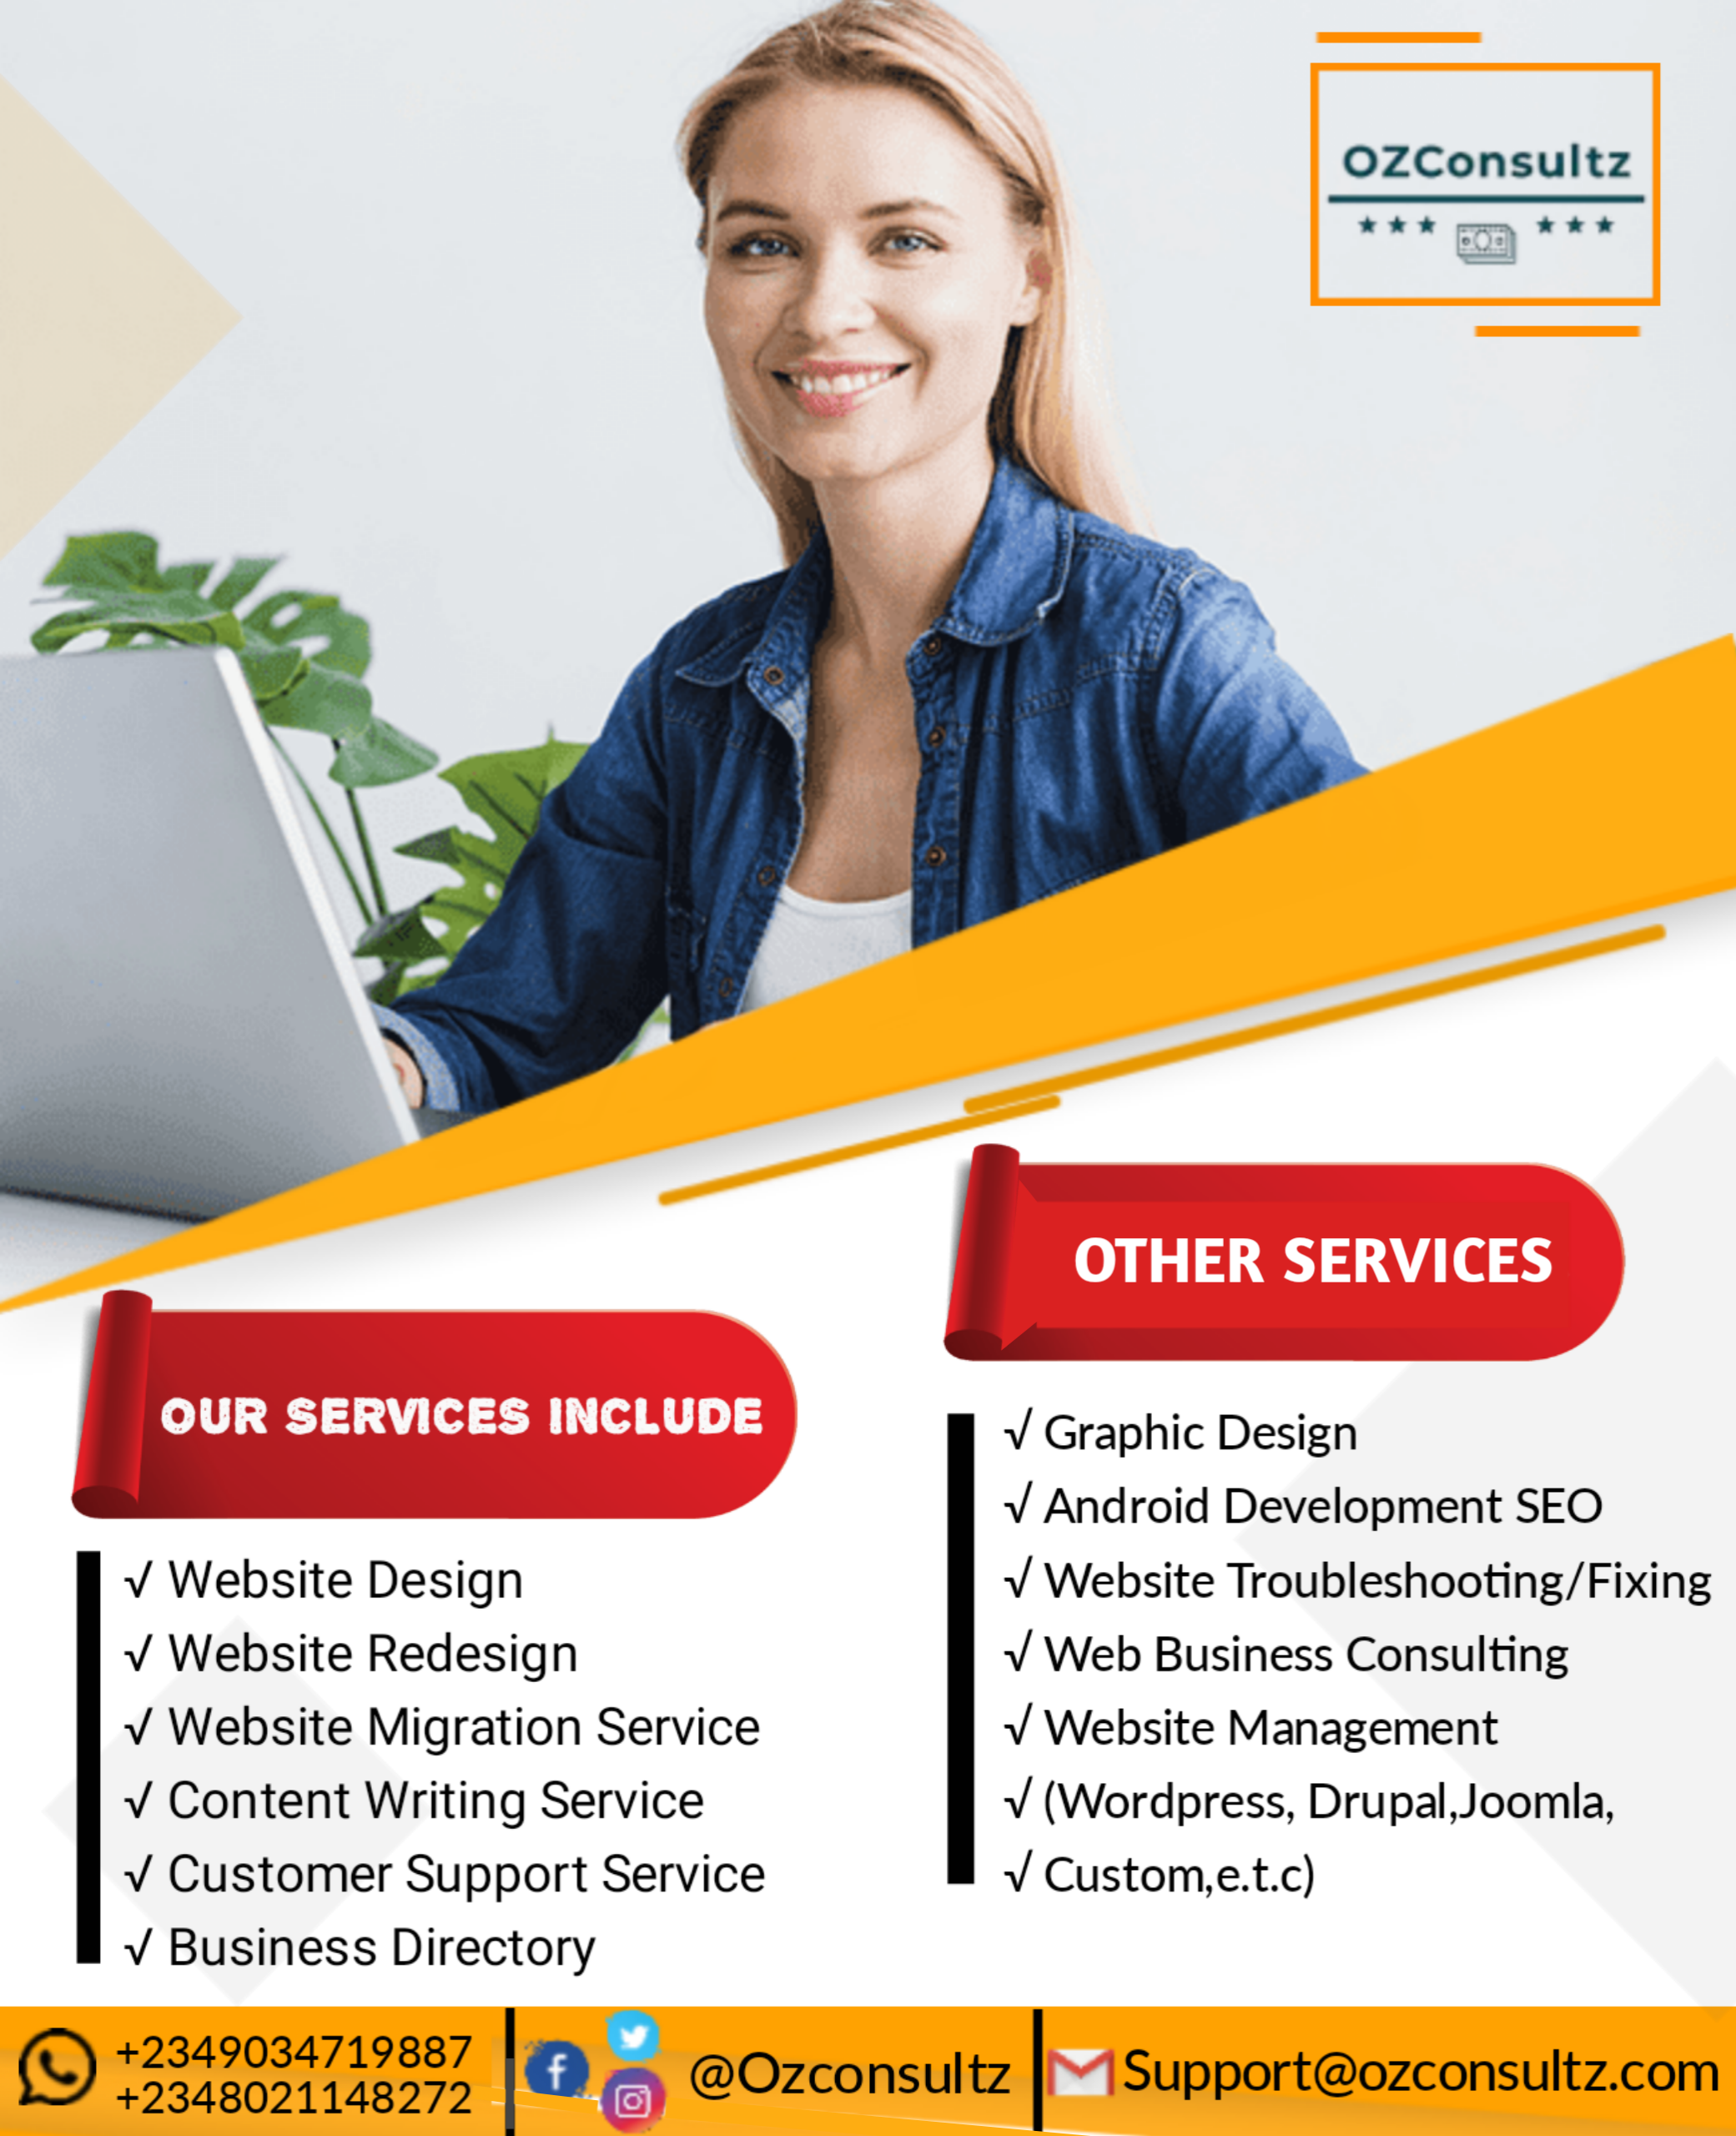 Ozconsultz- Affordable Web Design Agency